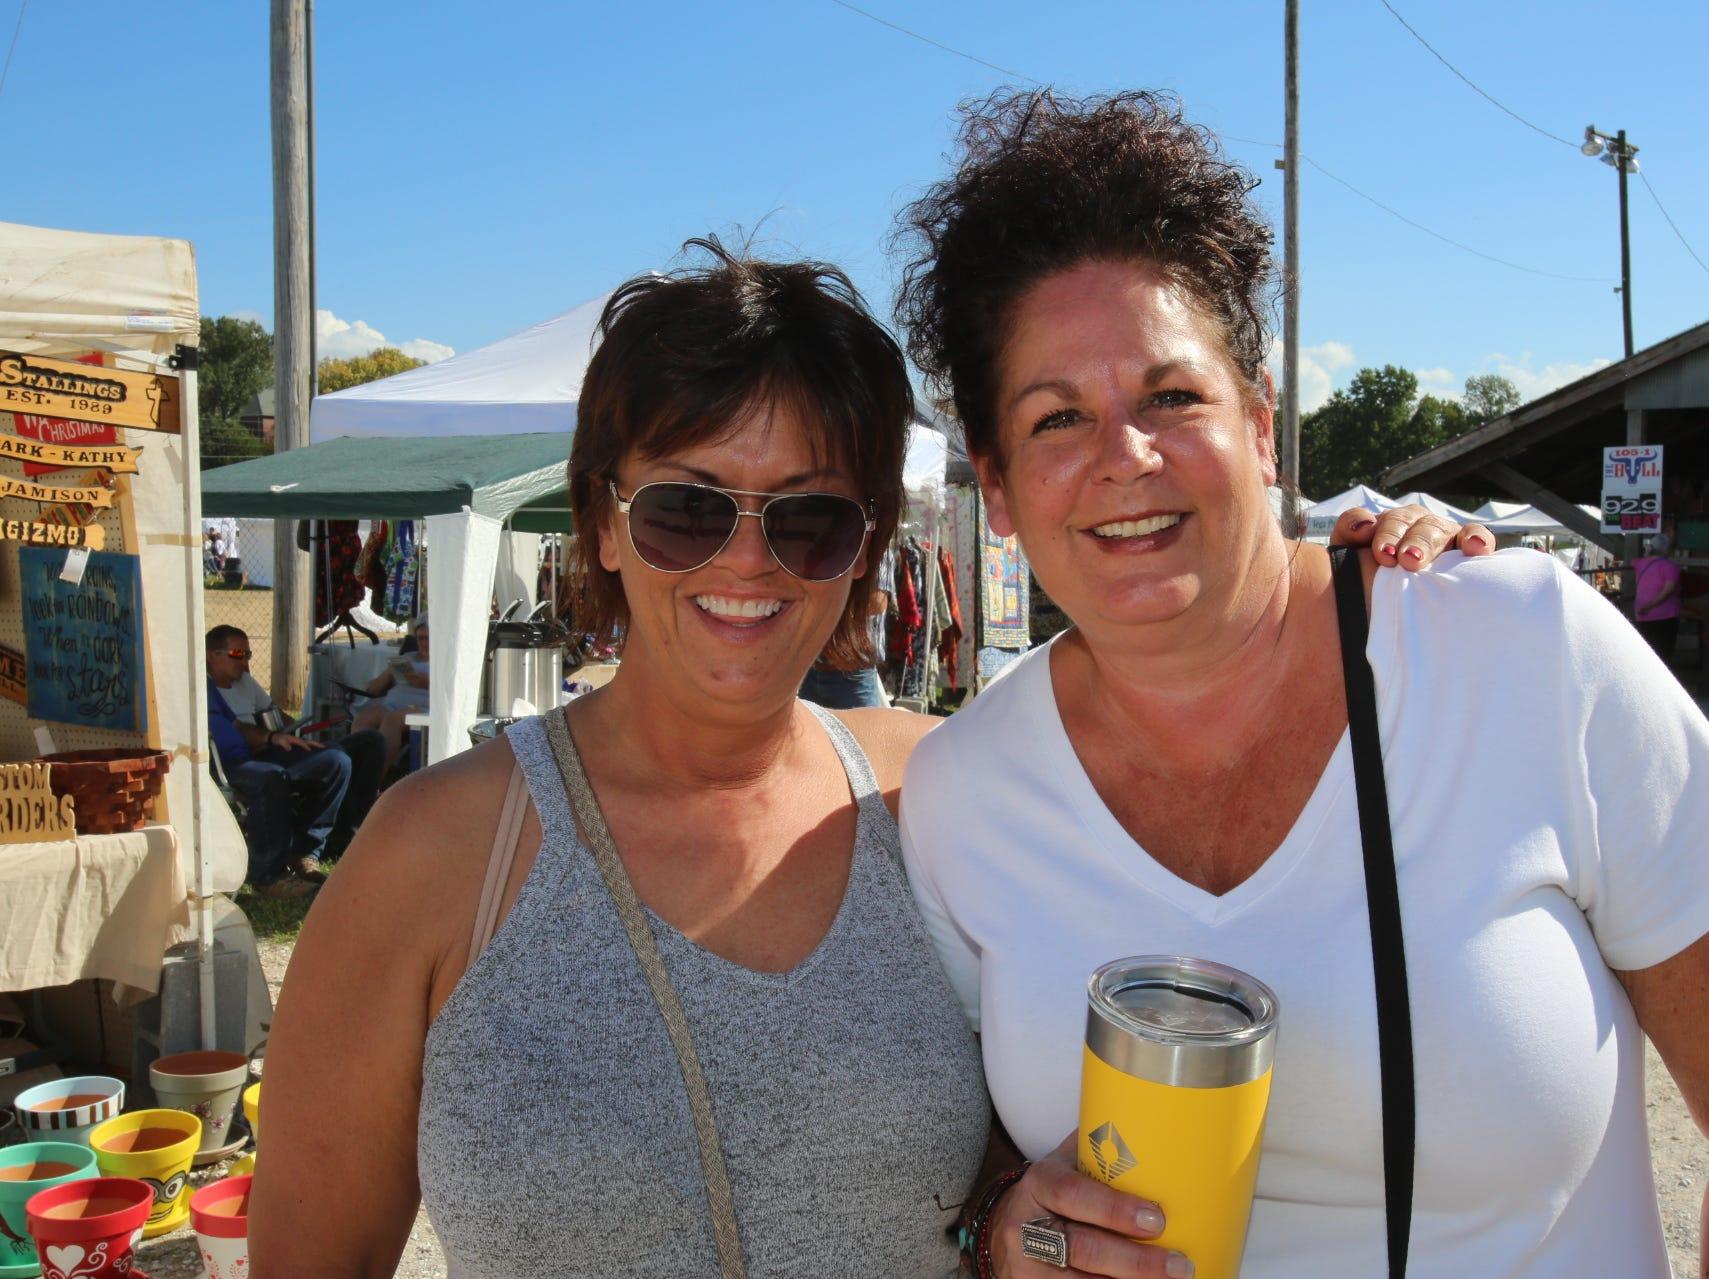 Cathy Lyon and Tammy Davidson